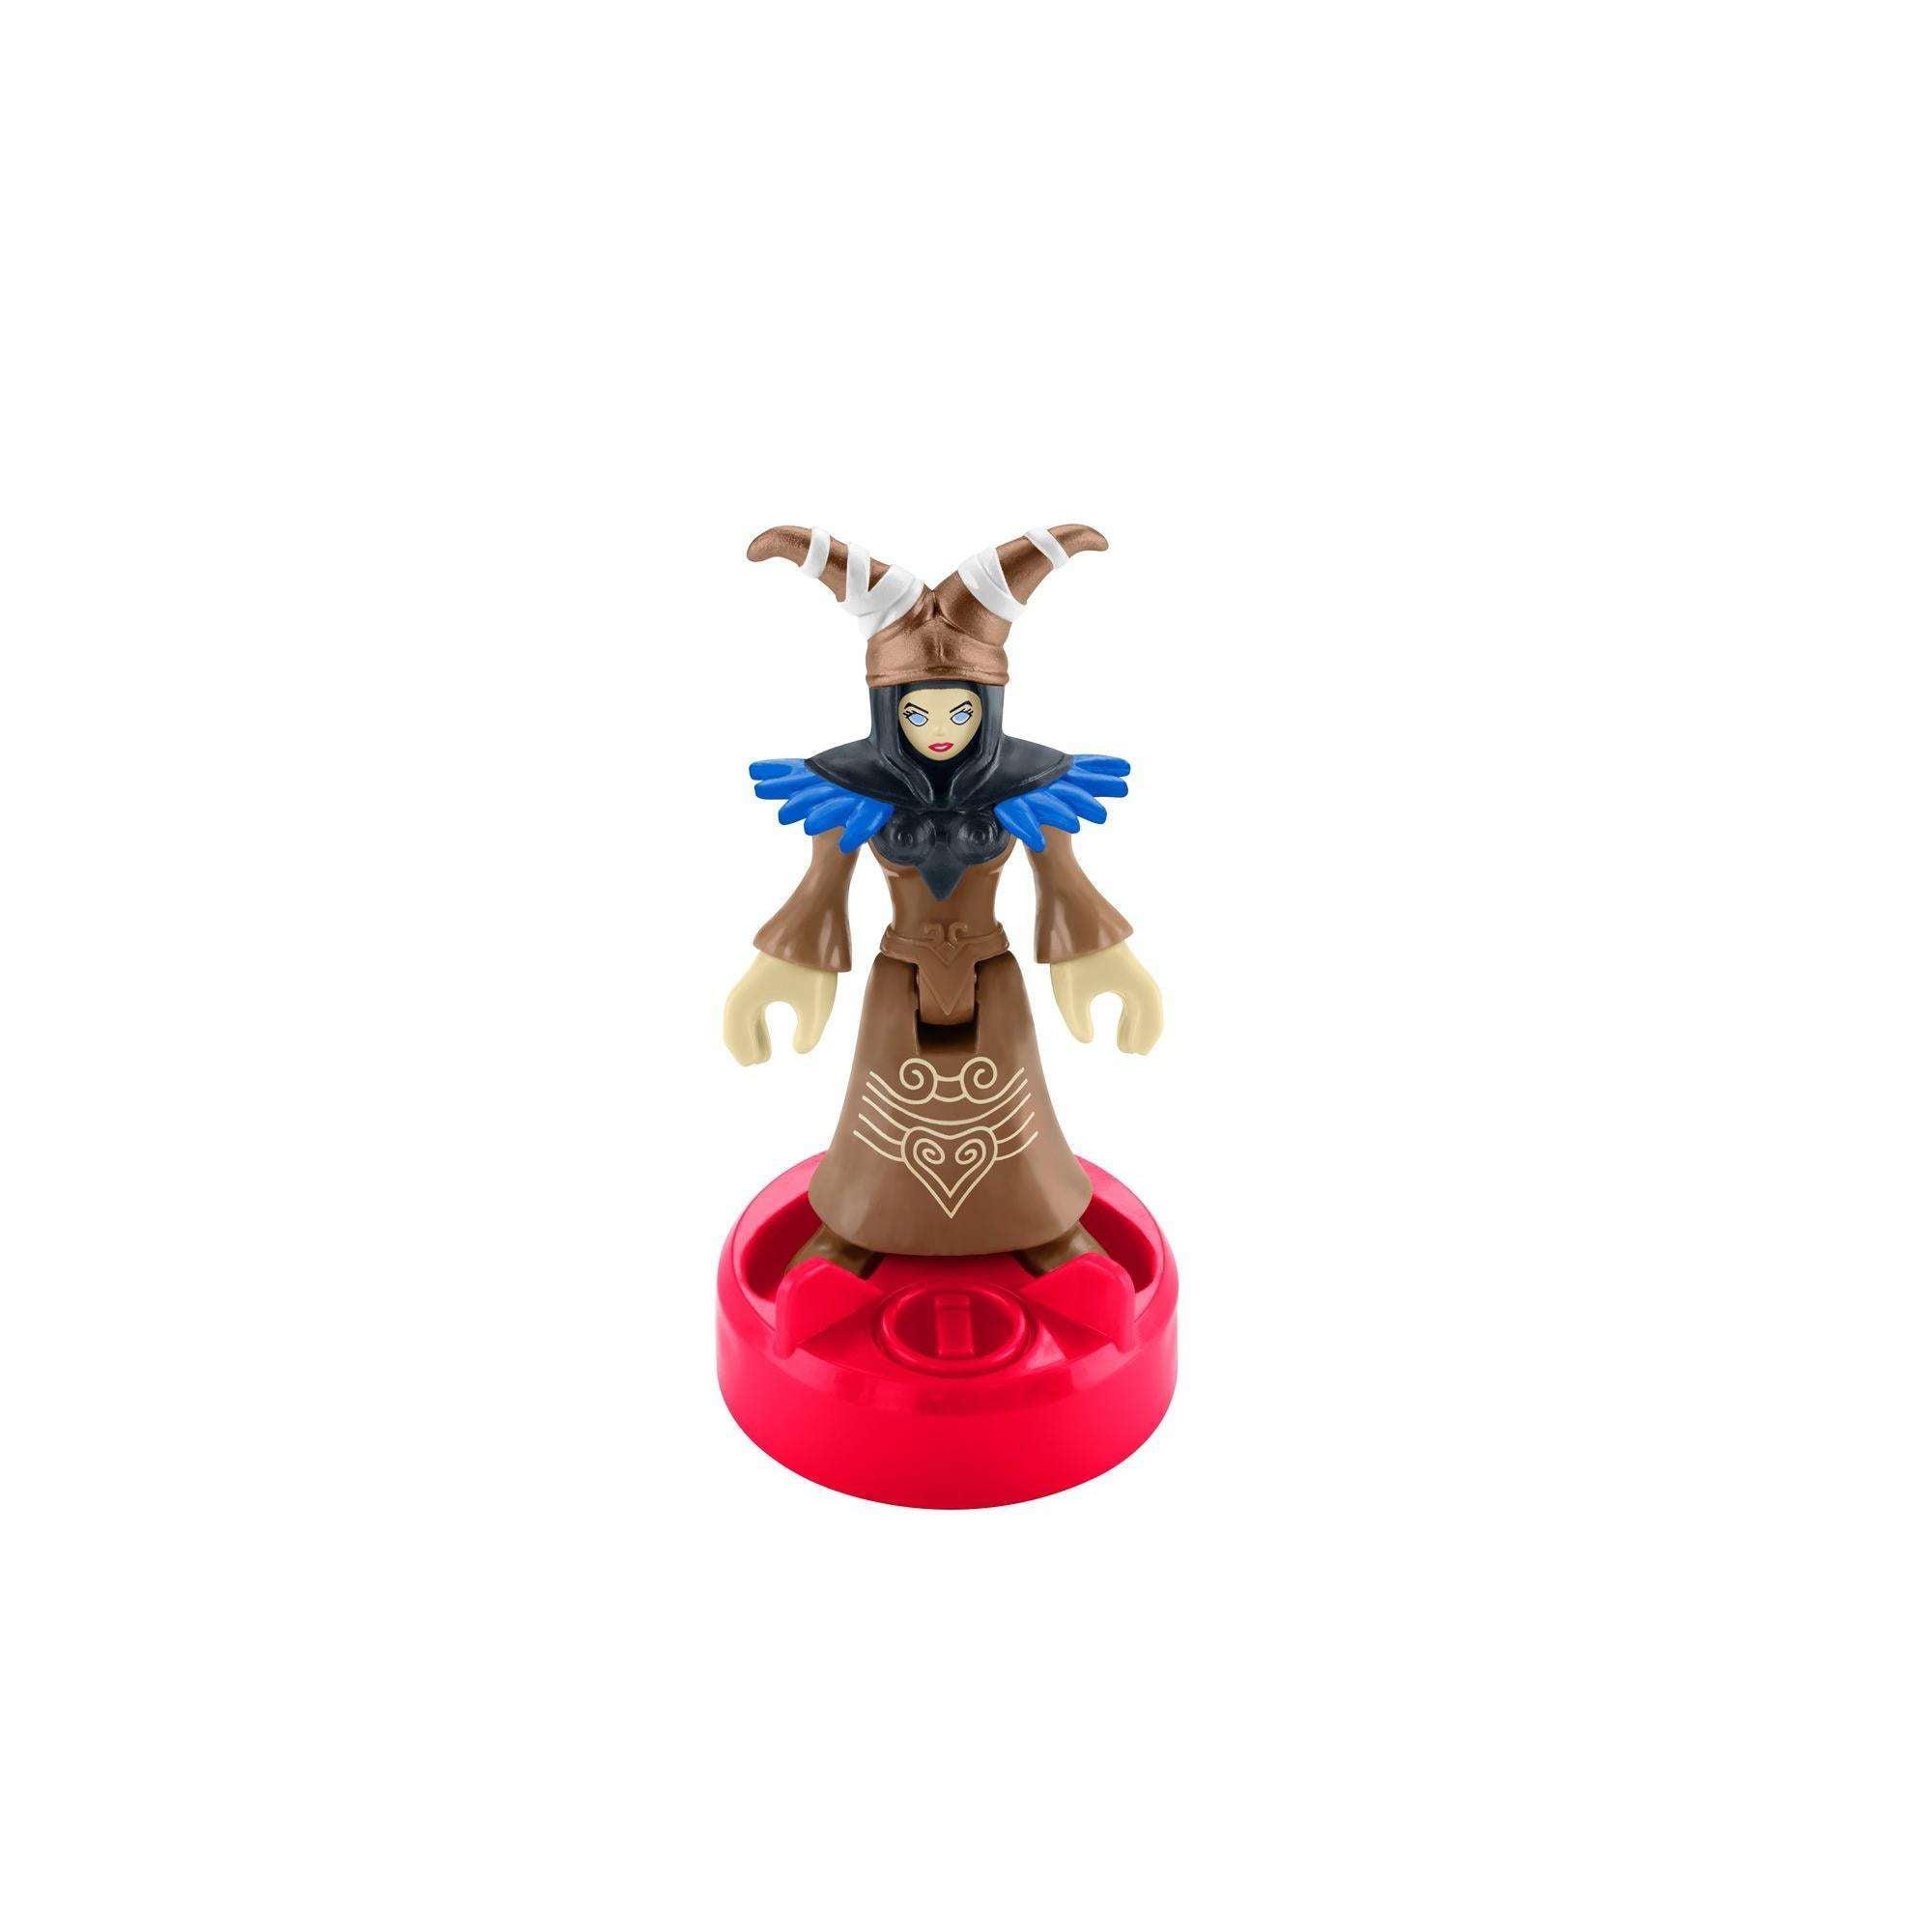 New Imaginext Power Rangers Rita Repulsa /& Moon Base Playset /& Figures Official